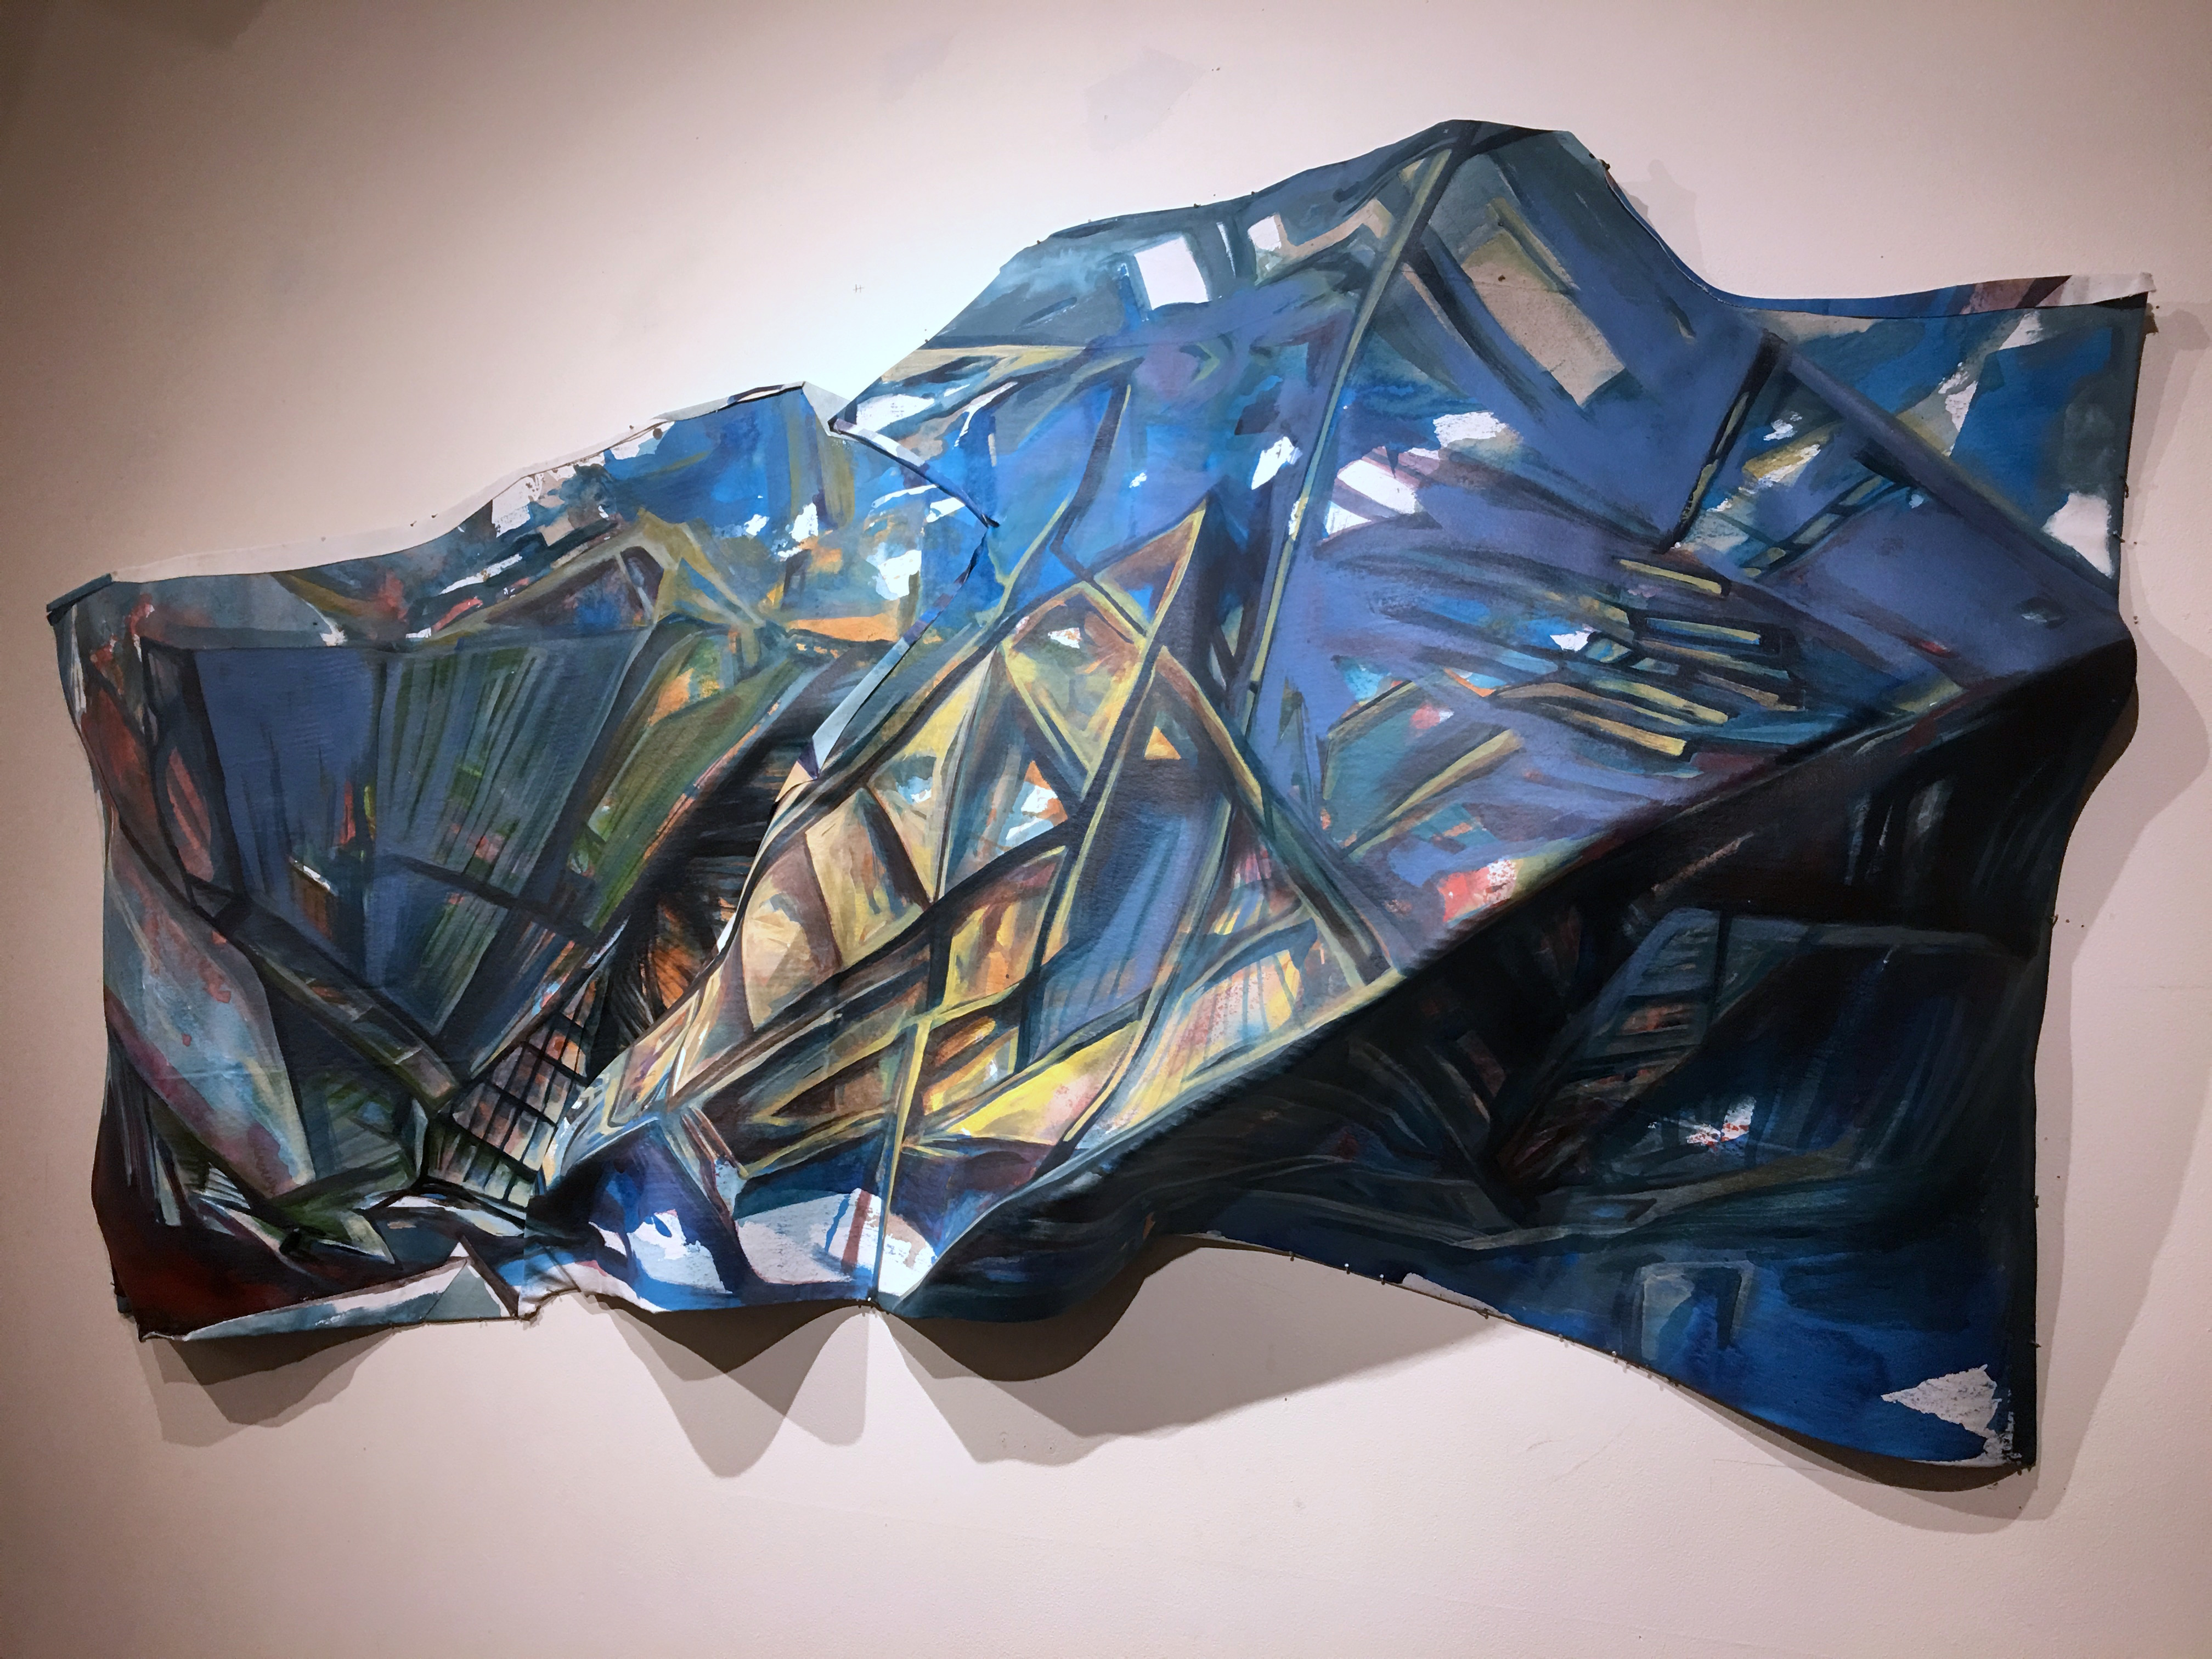 Futuristic Fabrication, acrylic on shaped canvas, 38x70x12 inches, 2016